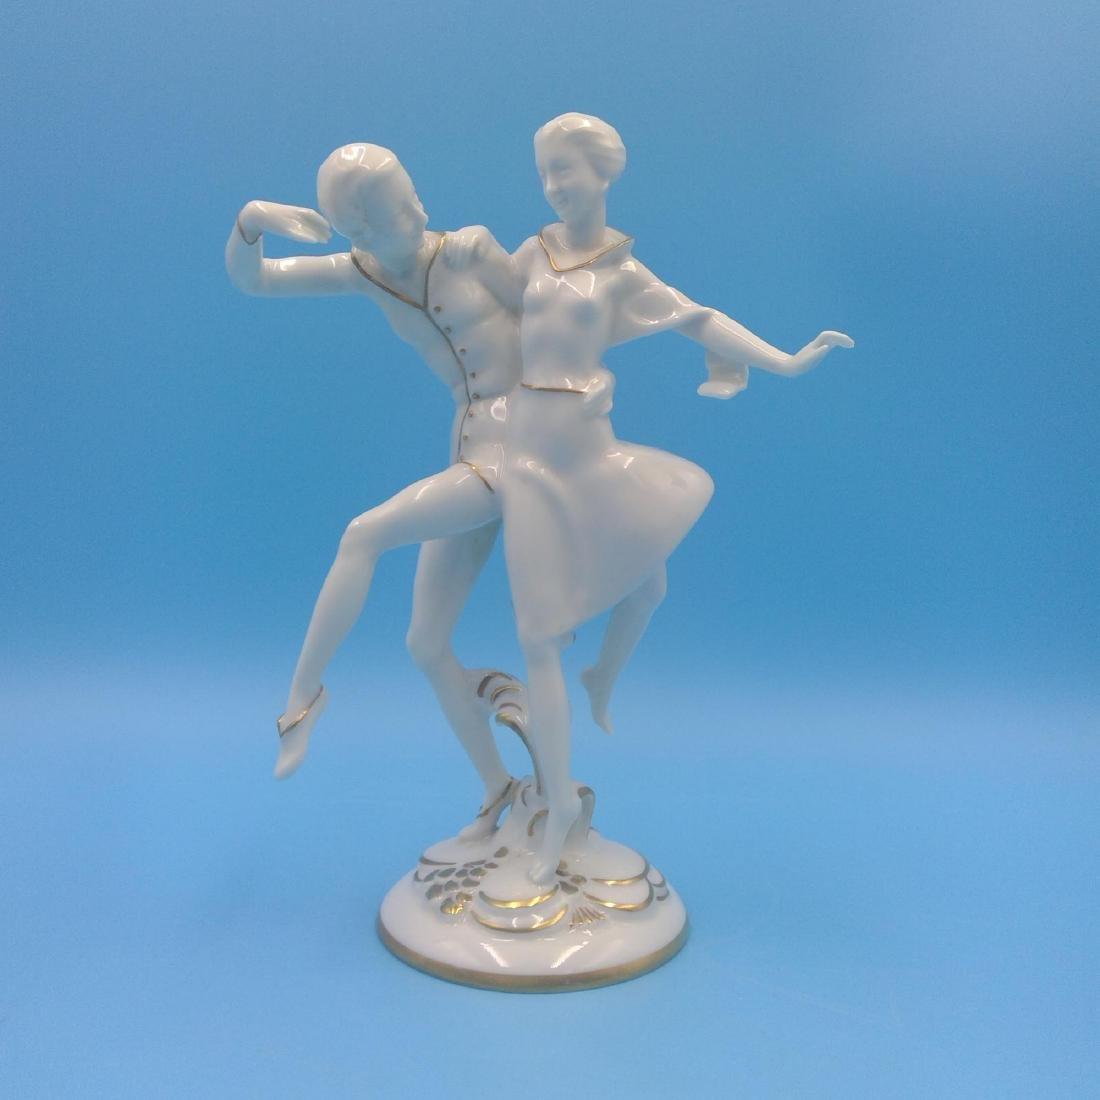 HUTSCHENREUTHER GERMAN PORCELAIN FIGURINE DANCERS